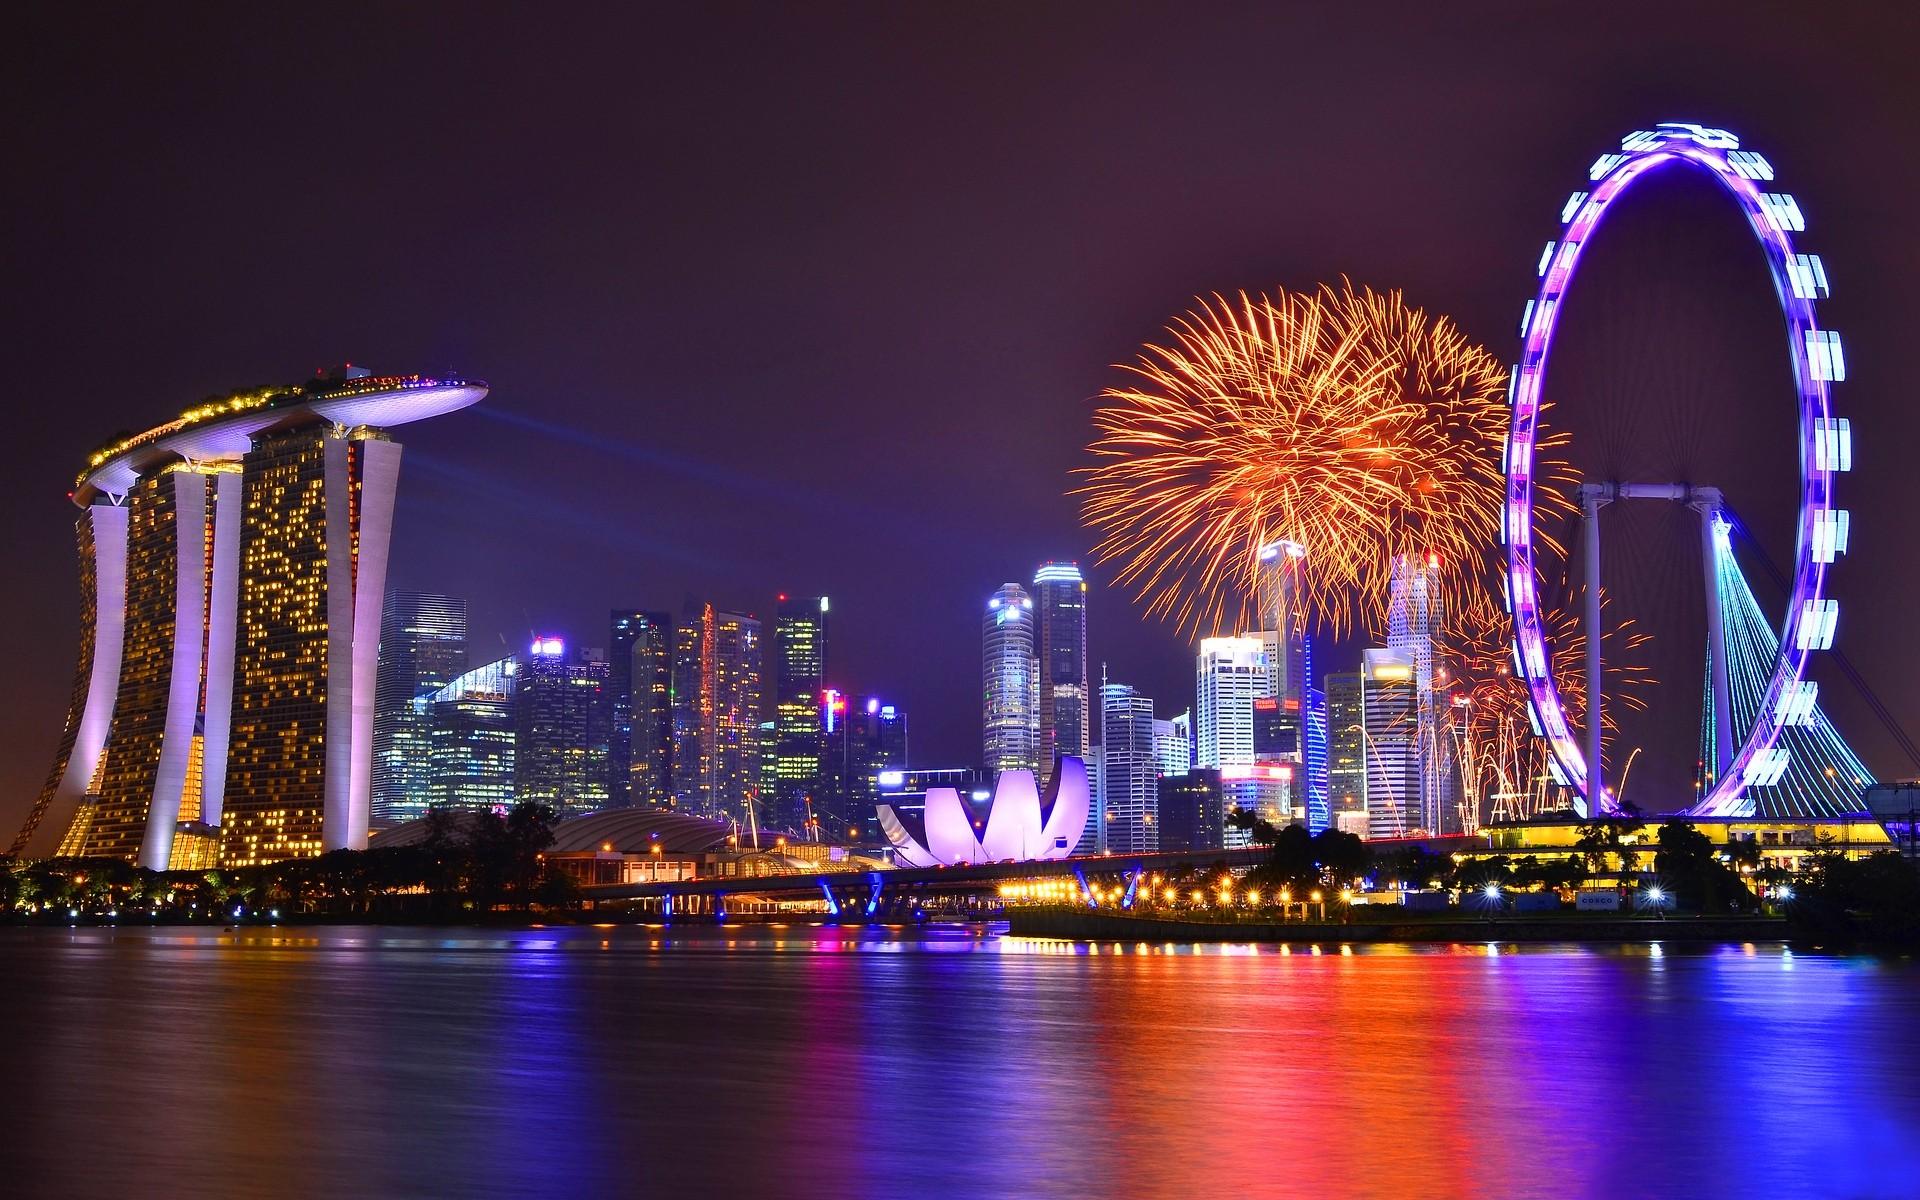 Singapore City and Sentosa